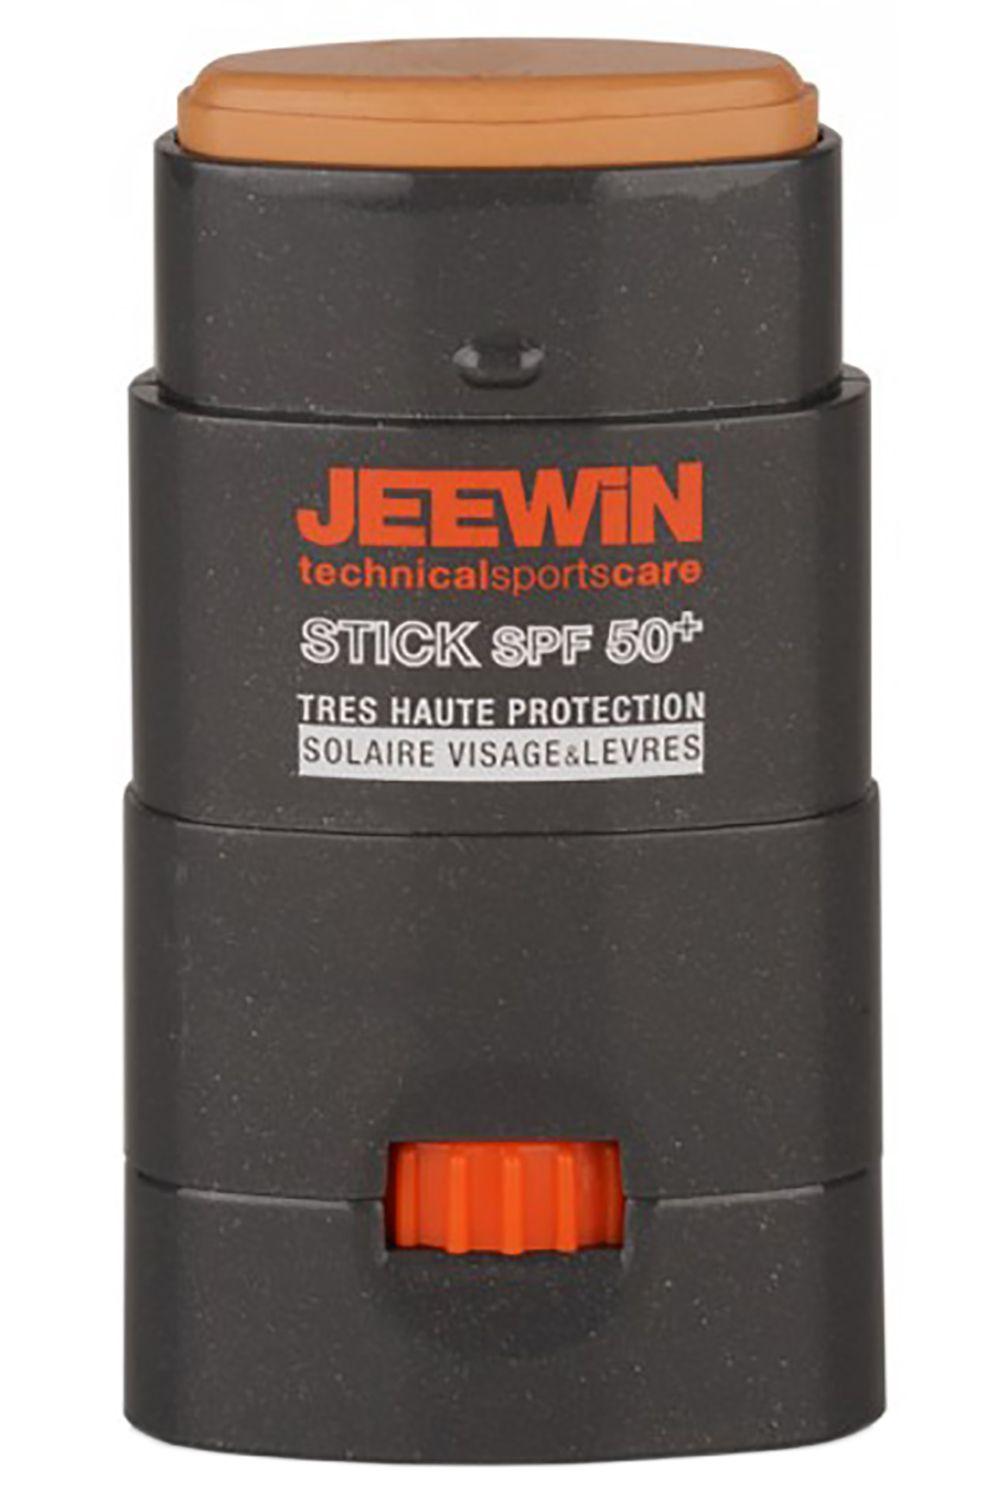 Jeewin Sunscreen FACE & LIPS SUN PROTECTING STICK SPF50+-12G Sand